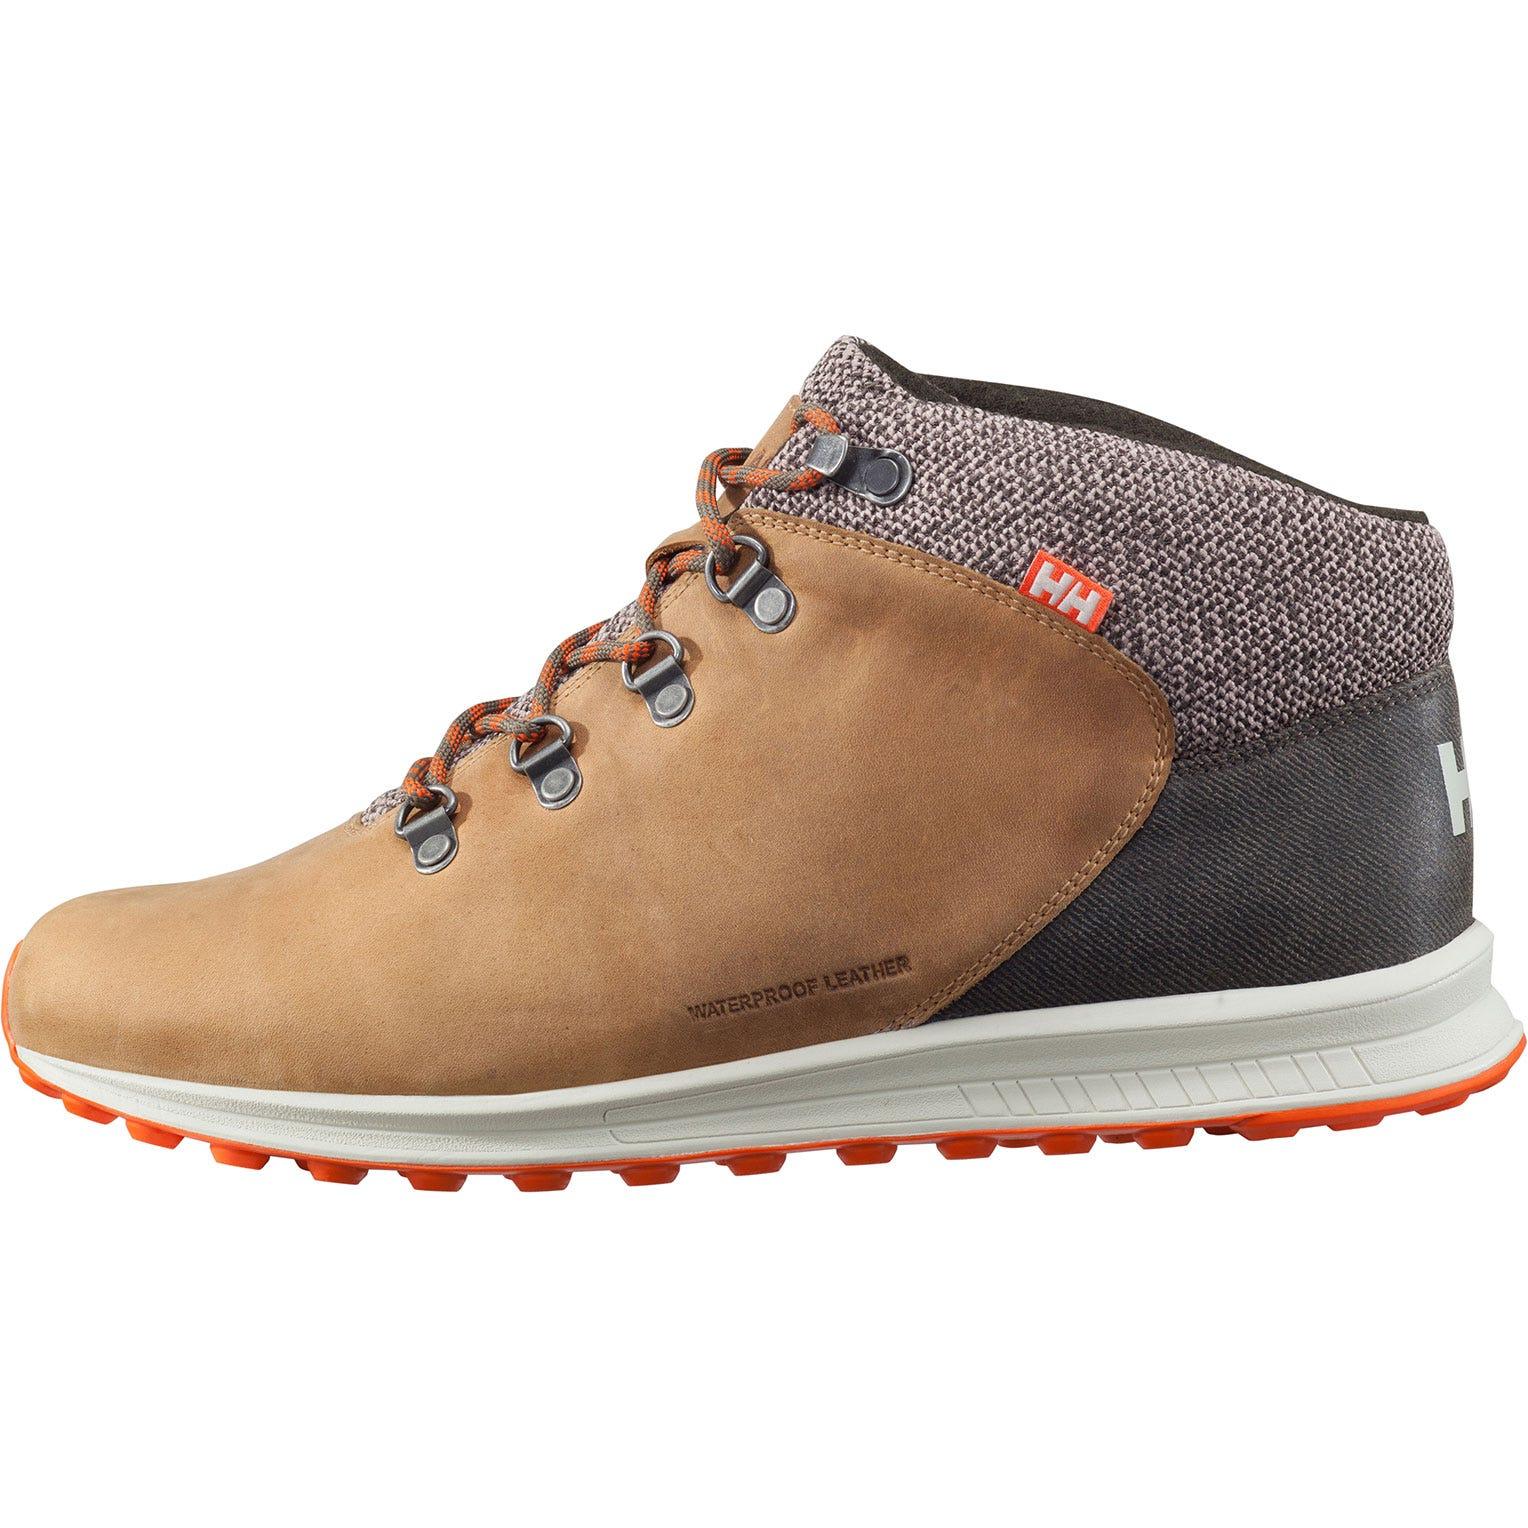 Helly Hansen Jaythen X Mens Casual Shoe Brown 44.5/10.5